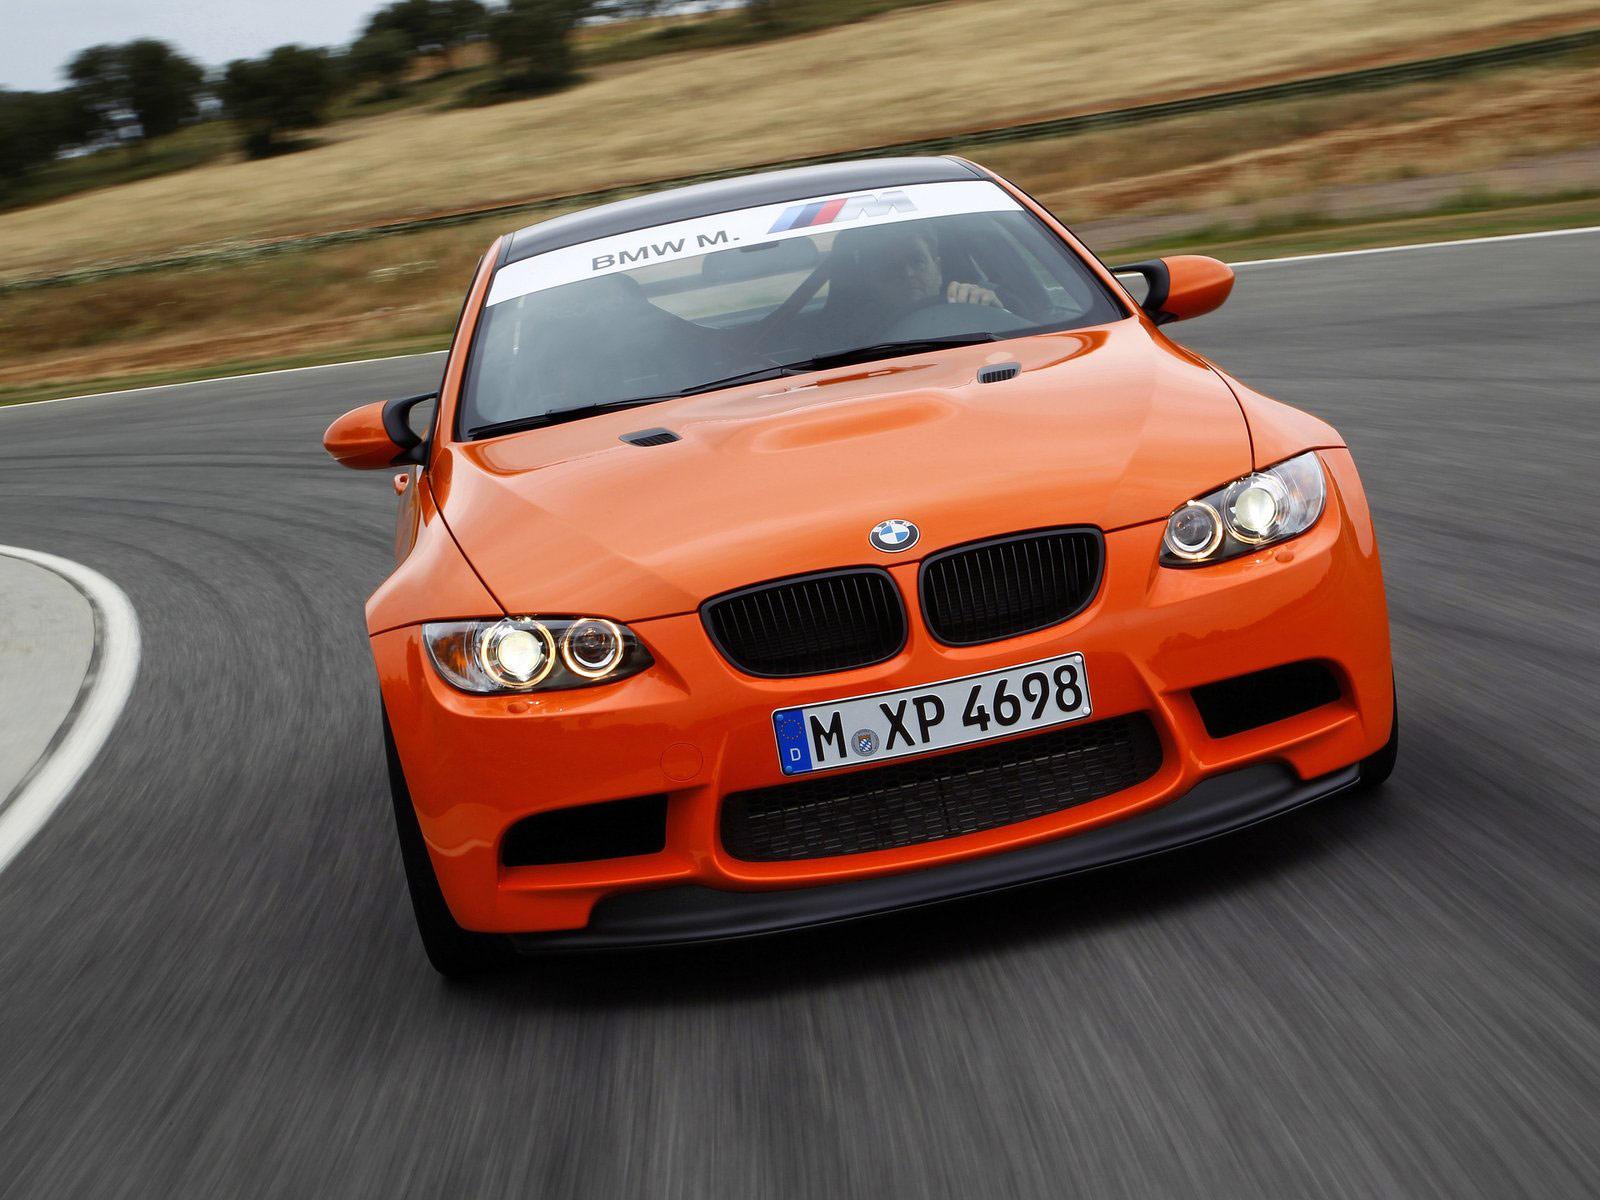 http://2.bp.blogspot.com/_DEP49tusZwg/TLU1rZ7Z9hI/AAAAAAAAB_8/AFQv_Sq4UGY/s1600/BMW-M3_GTS_2011_9.jpg